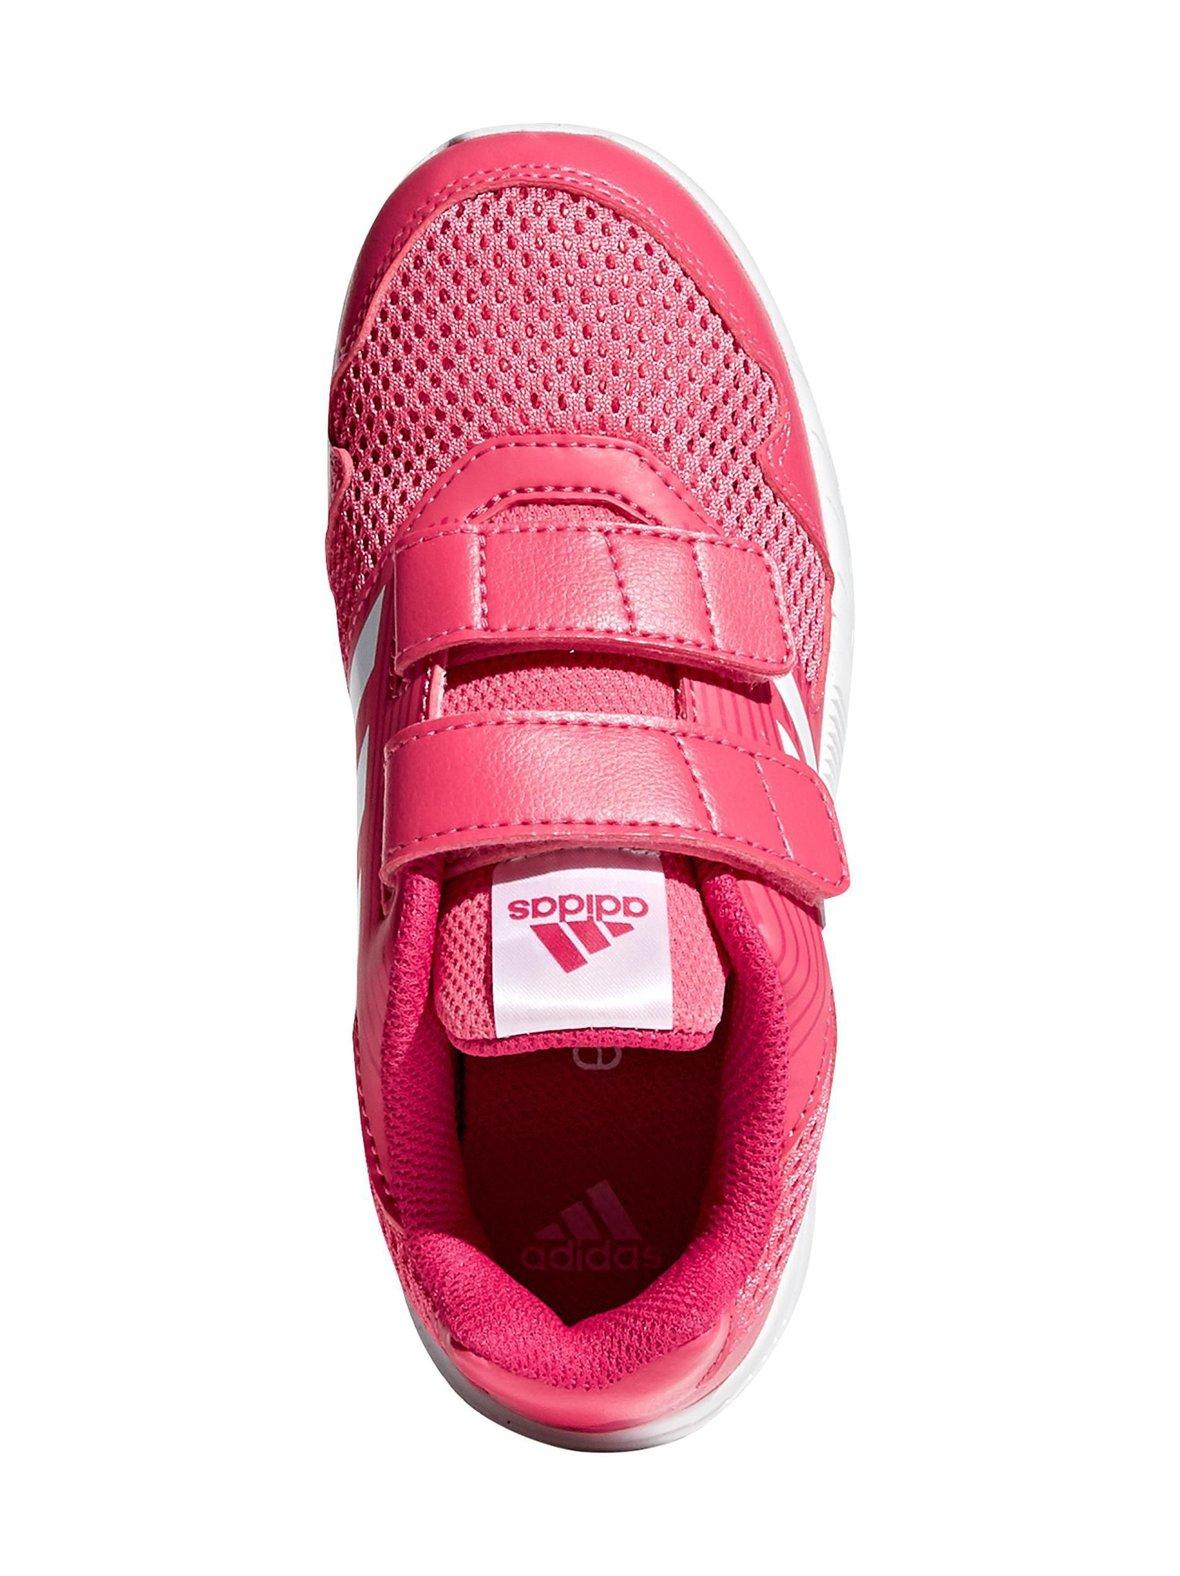 Pinkftwr Berry Performance pinkki Altarun Adidas Real Whitevivid HAwTxB